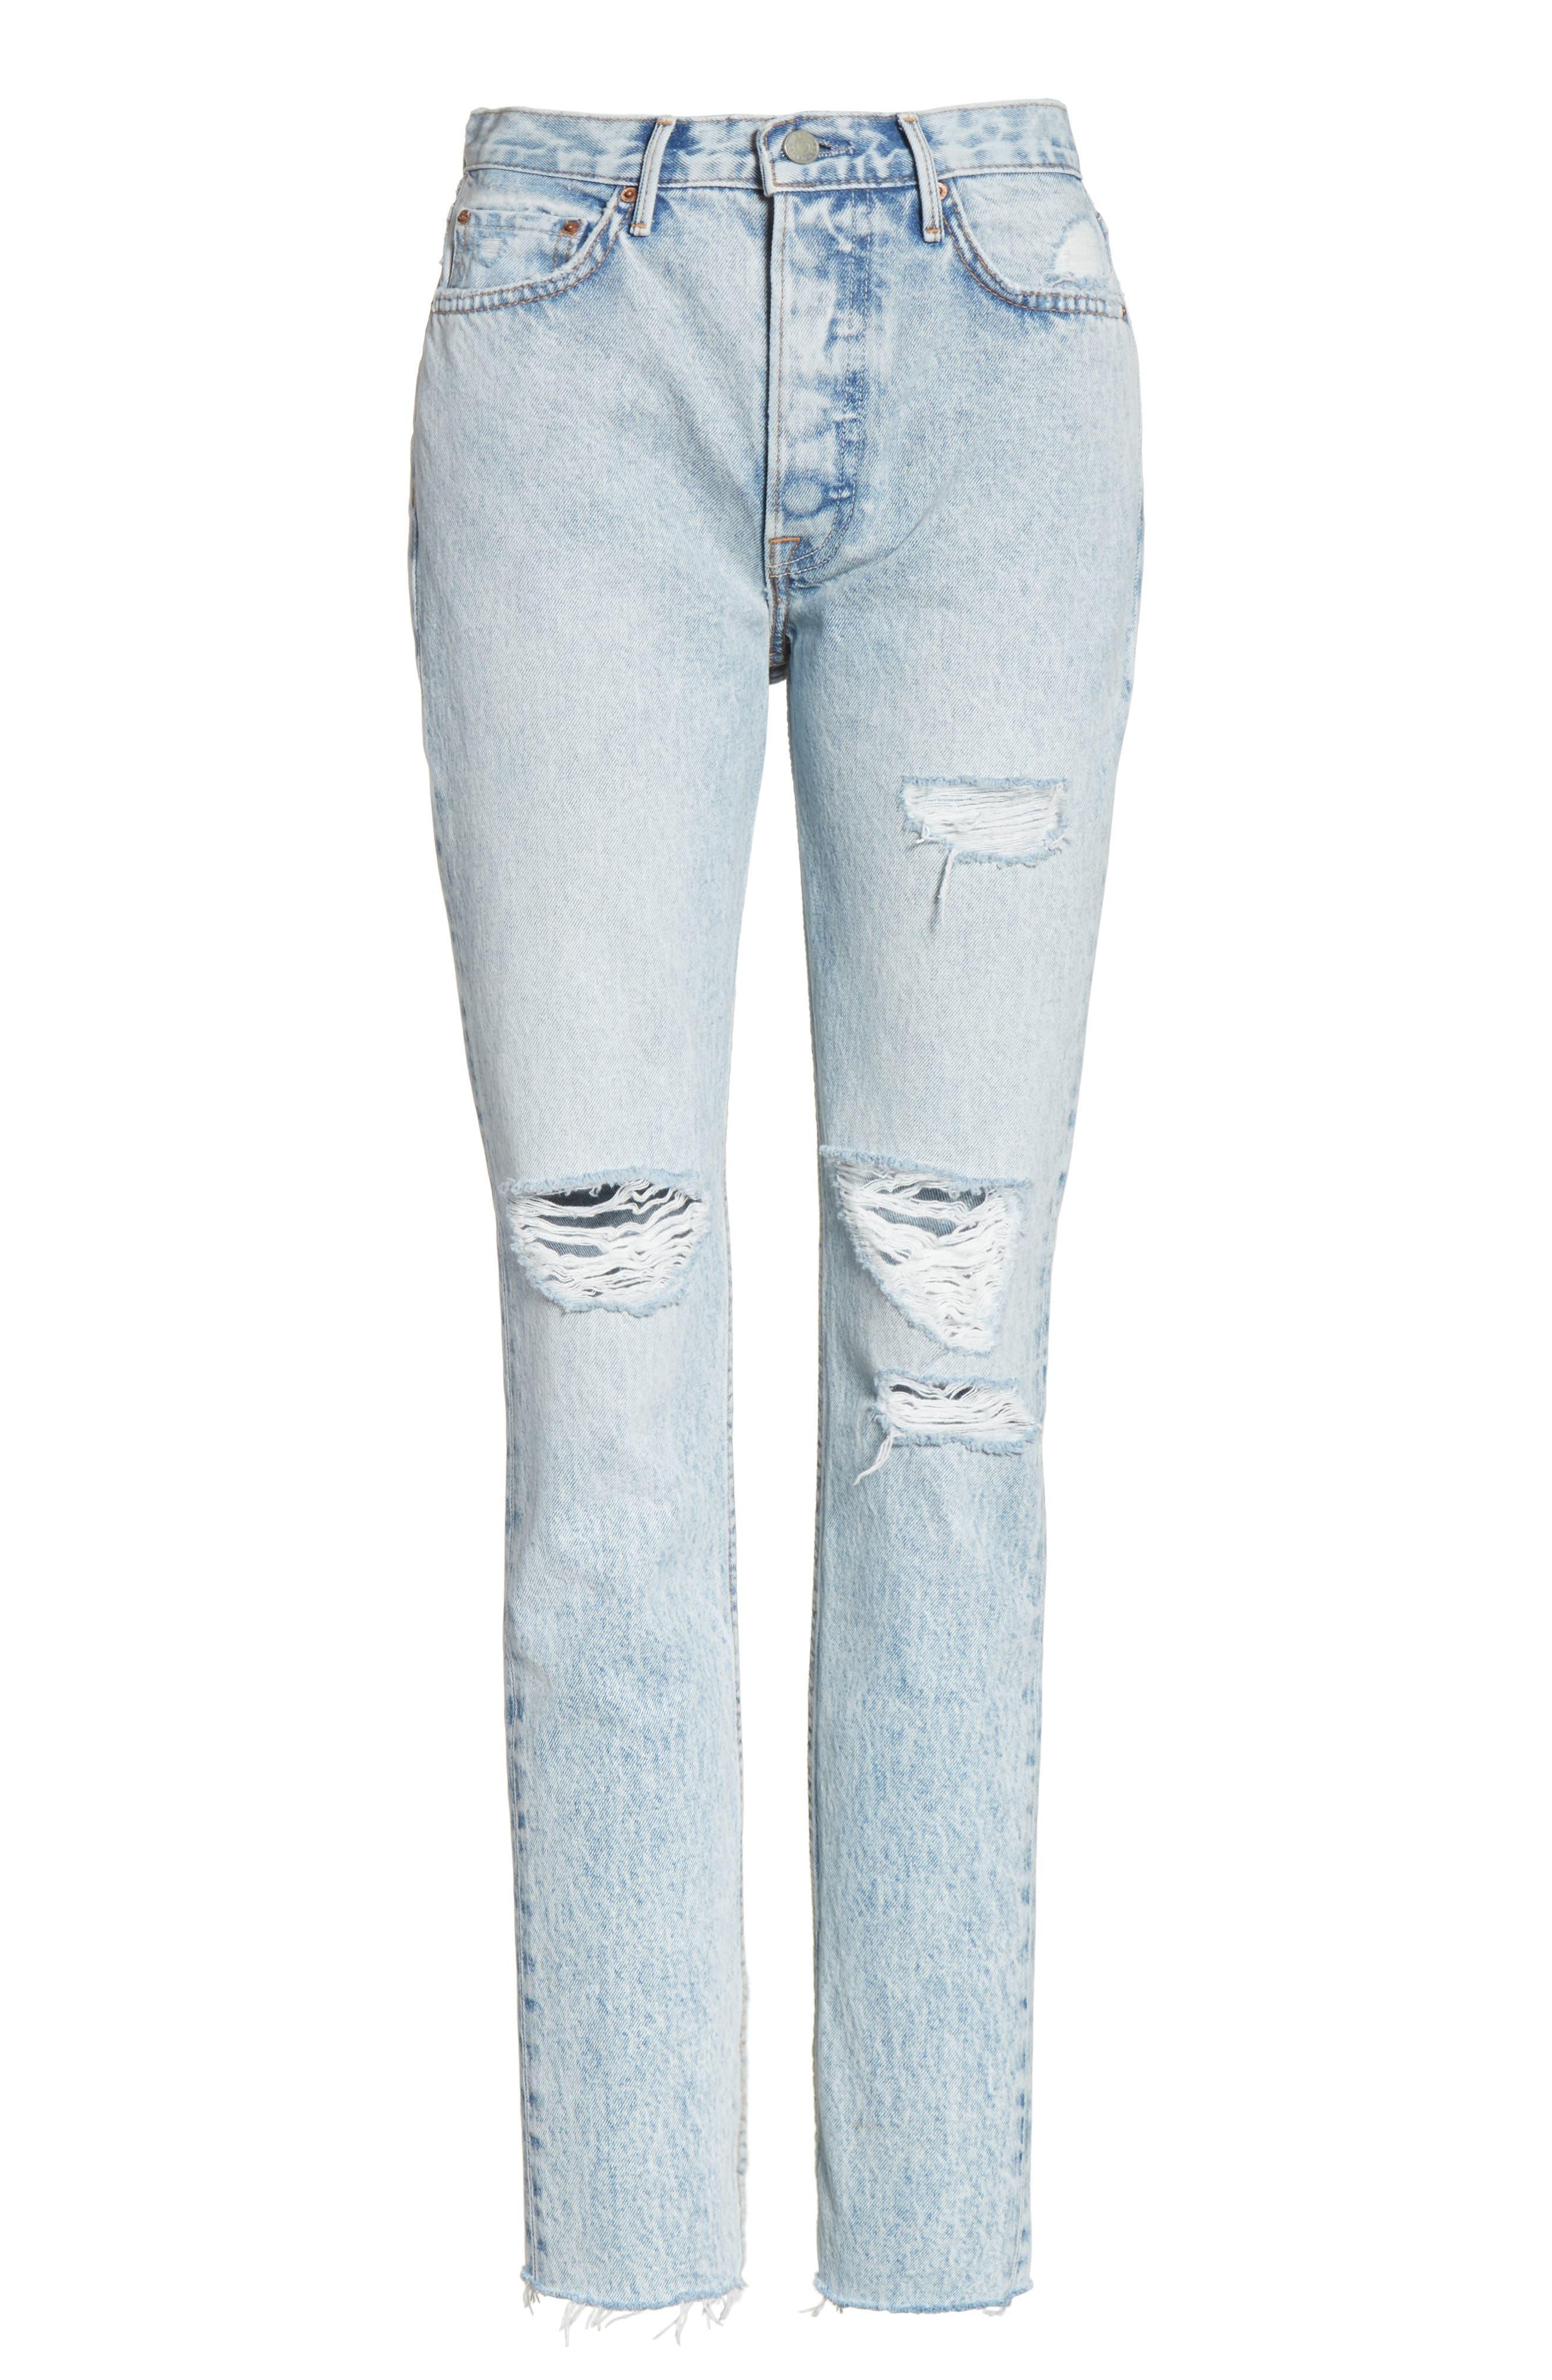 Karolina Ripped Skinny Jeans,                             Alternate thumbnail 6, color,                             487